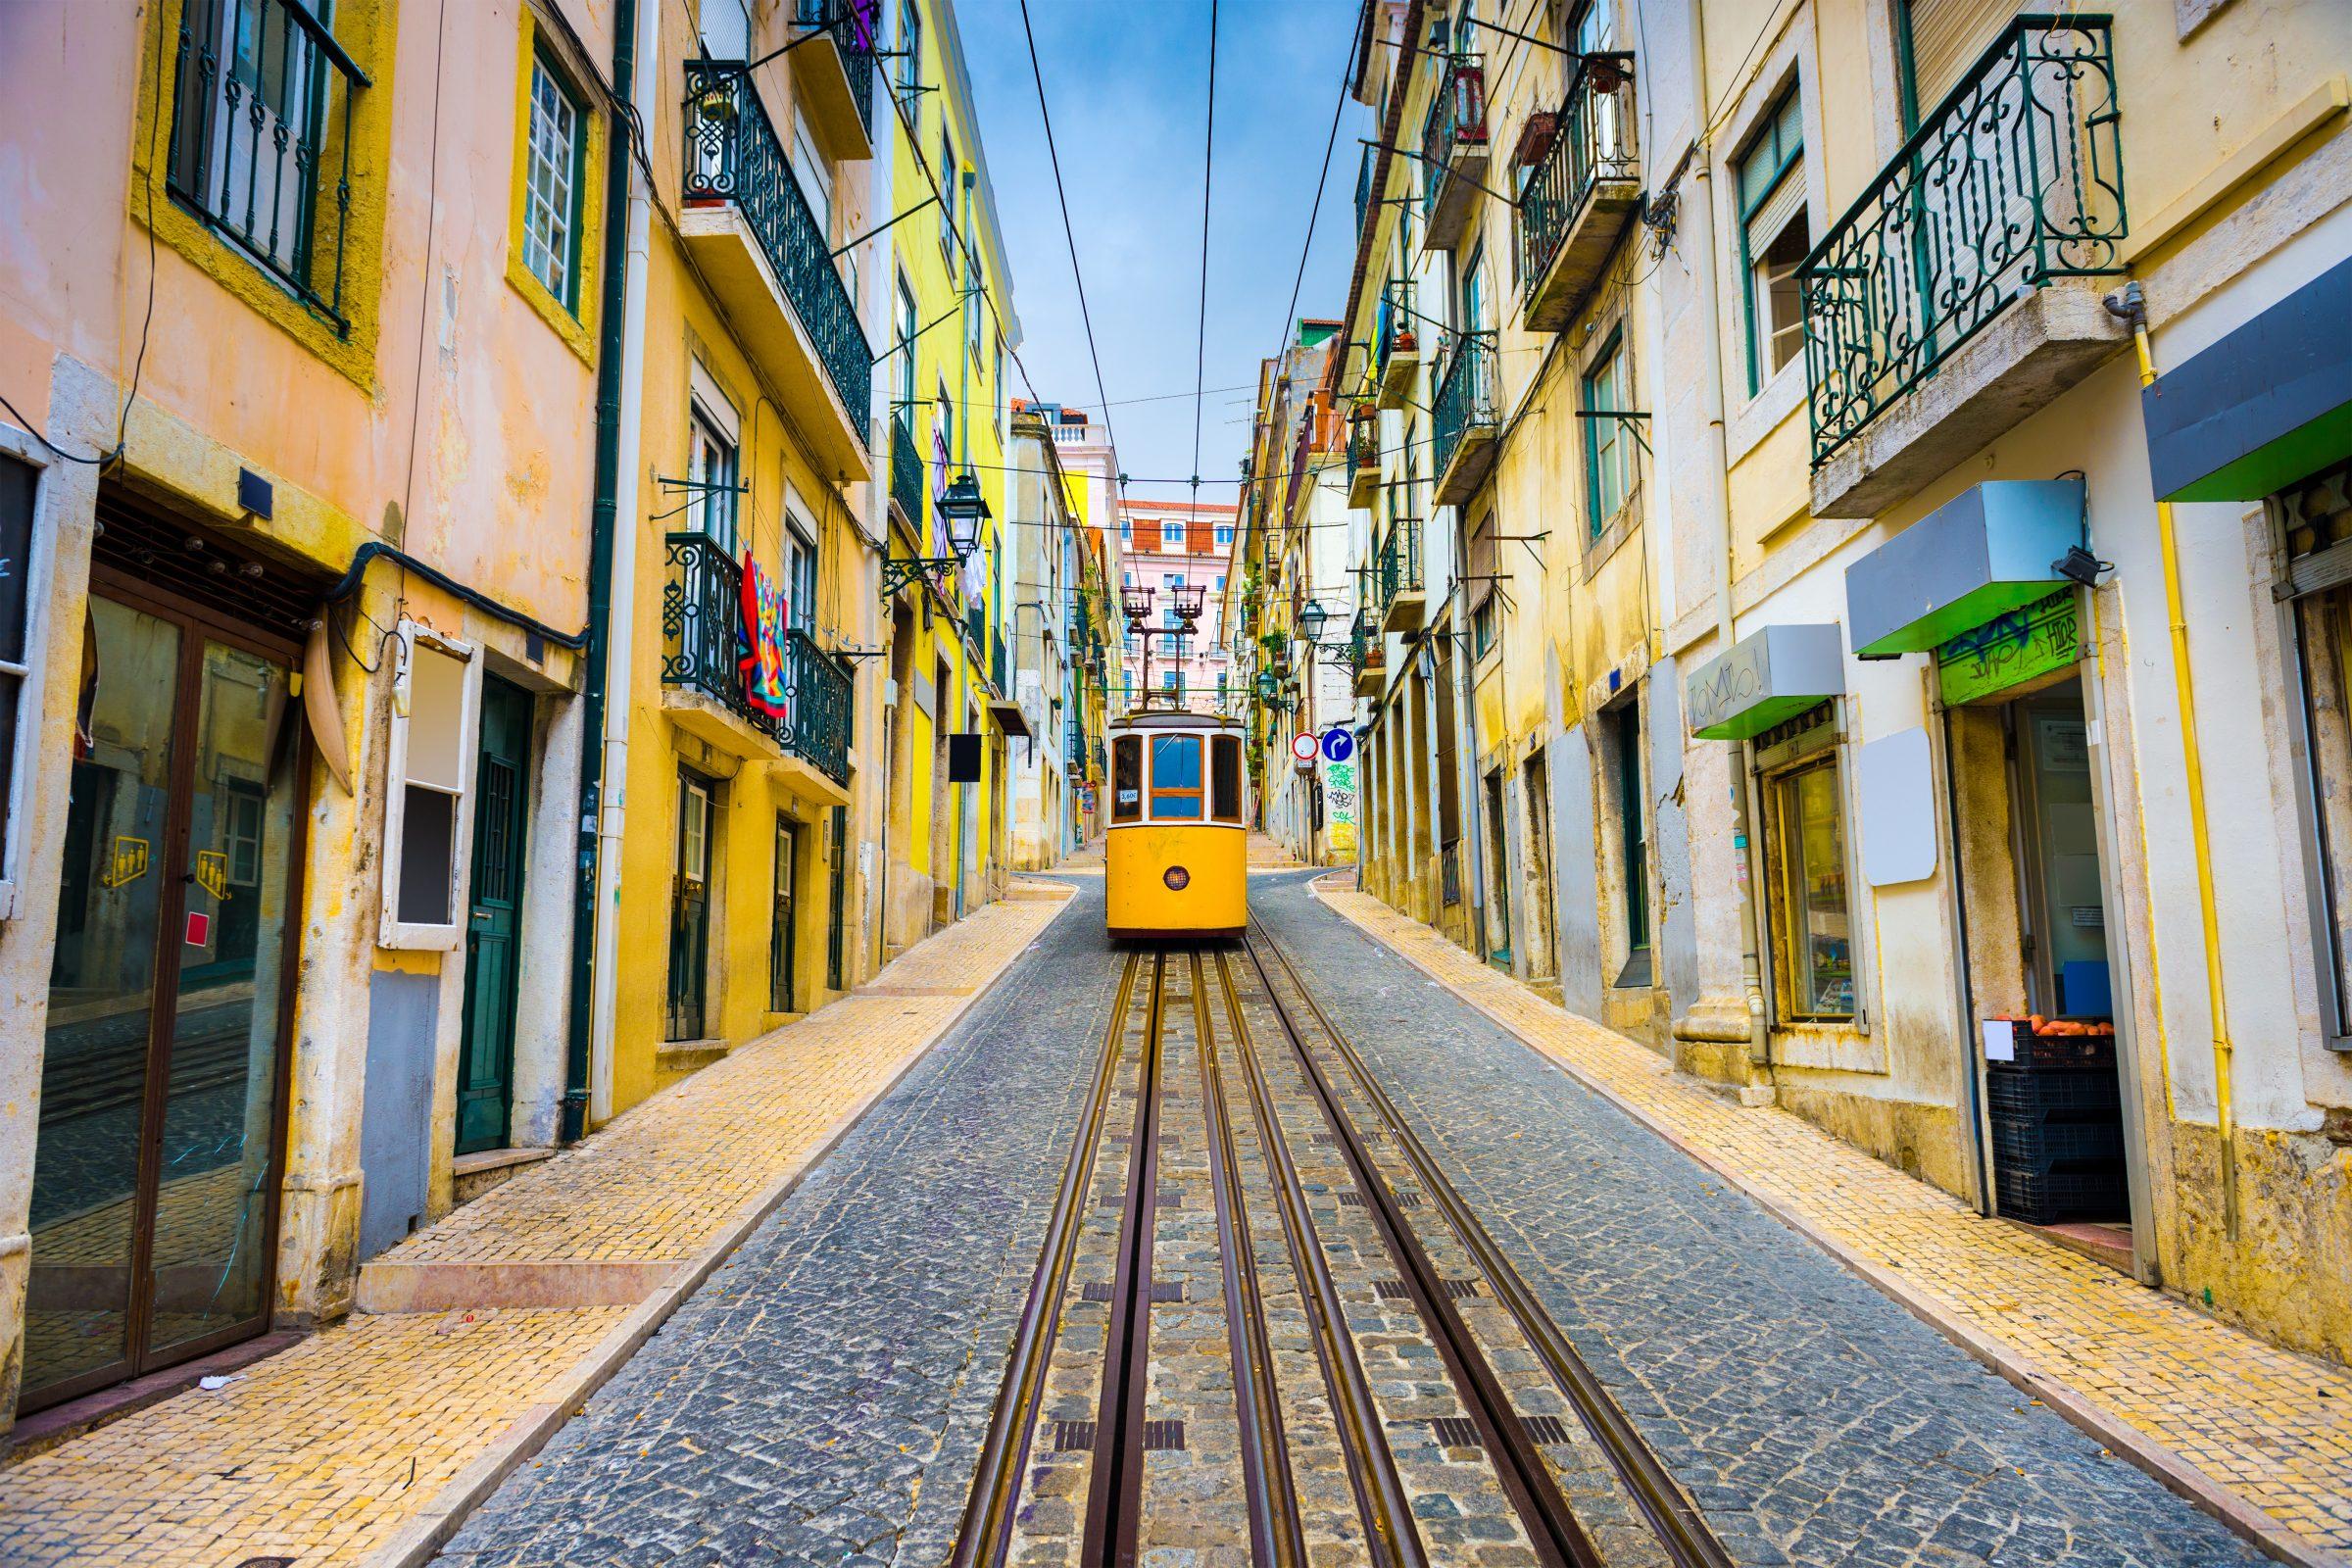 Busca por certidões portuguesas